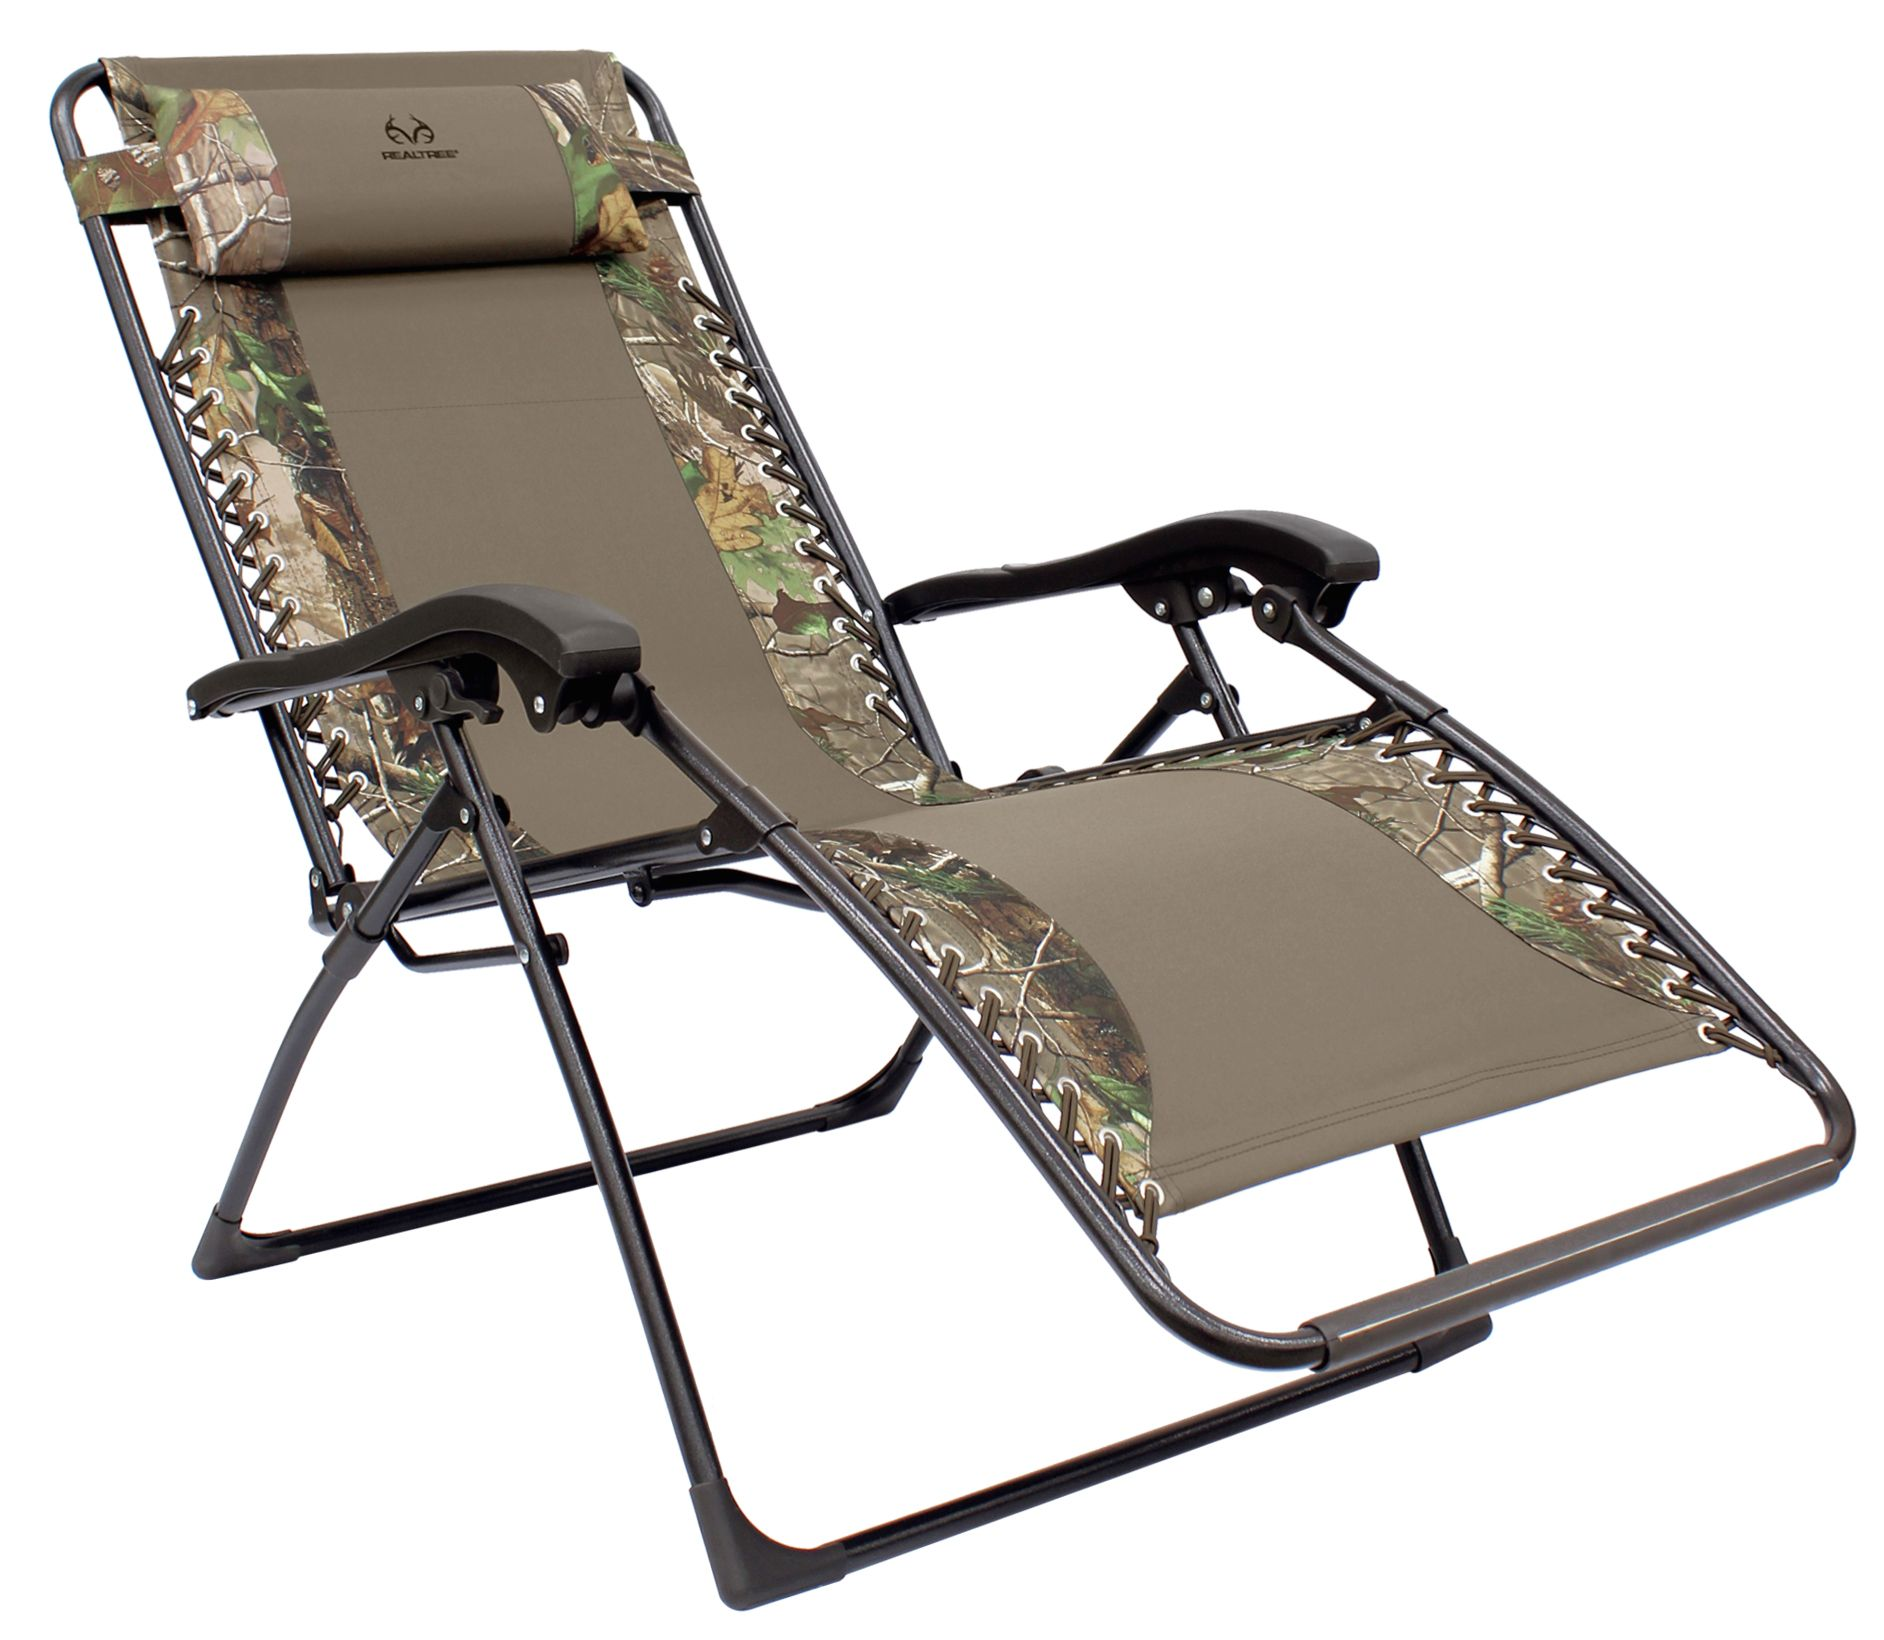 Summerwinds Realtree Zero Gravity Chair